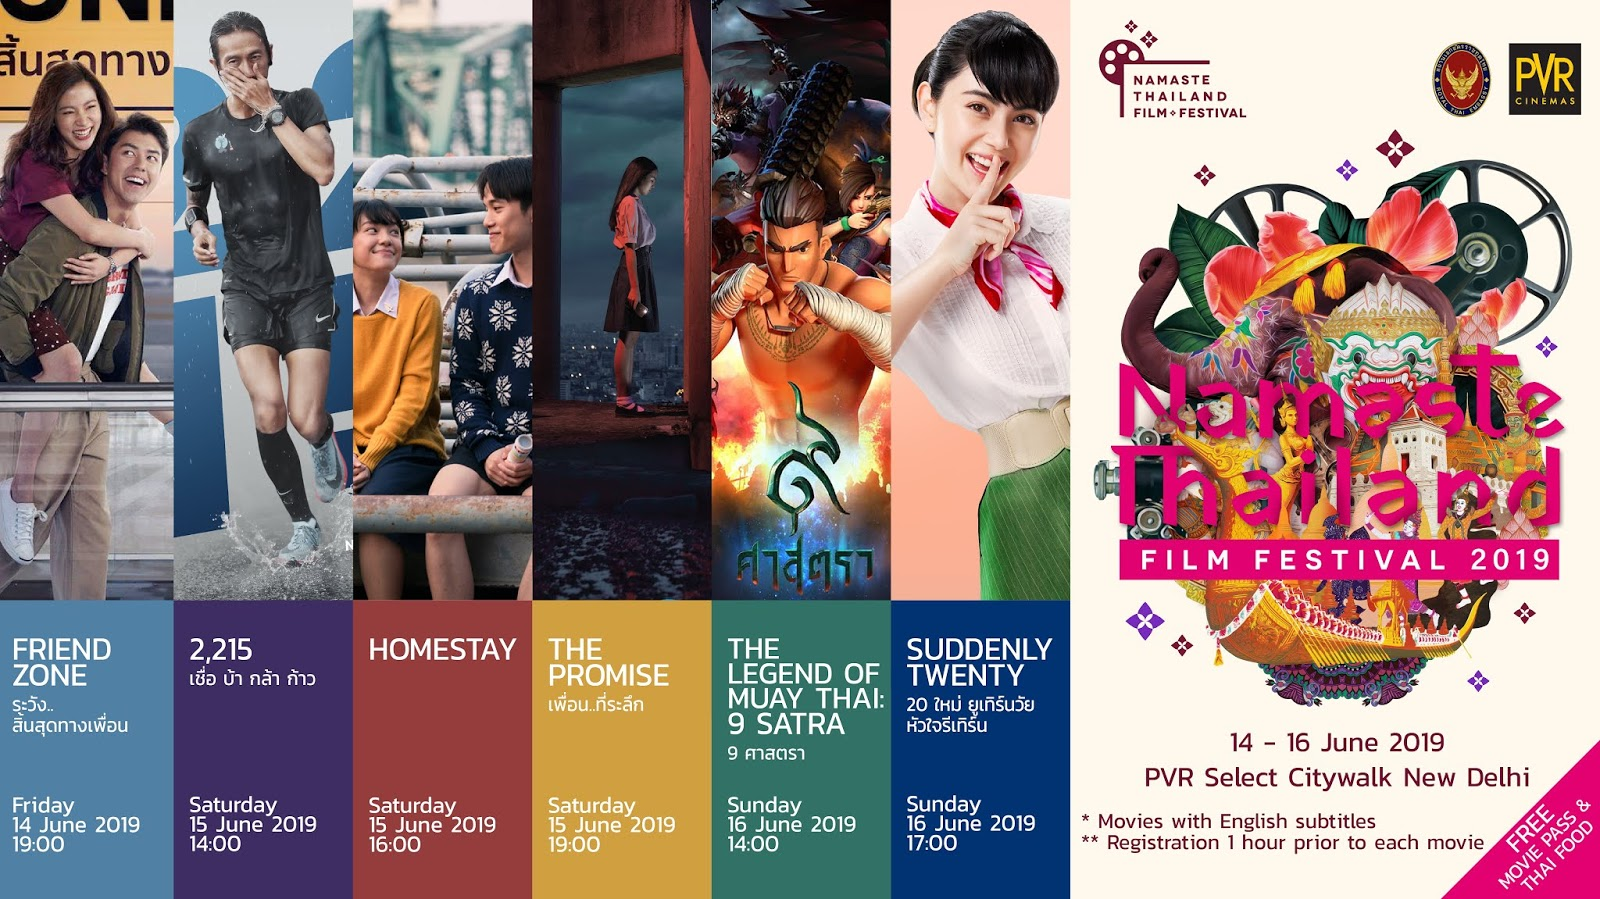 Namaste Thailand Film Festival 2019 - NP